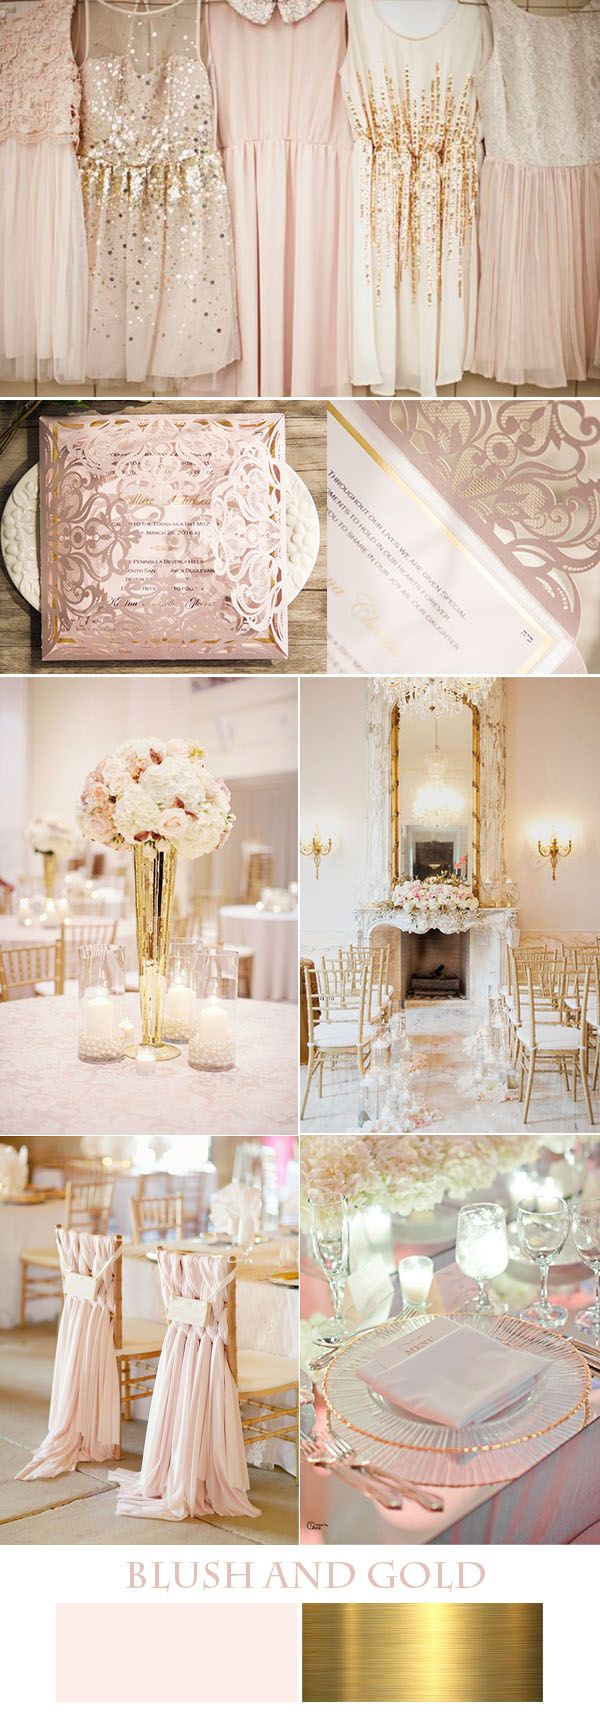 best 25 dusty pink weddings ideas on pinterest rose. Black Bedroom Furniture Sets. Home Design Ideas